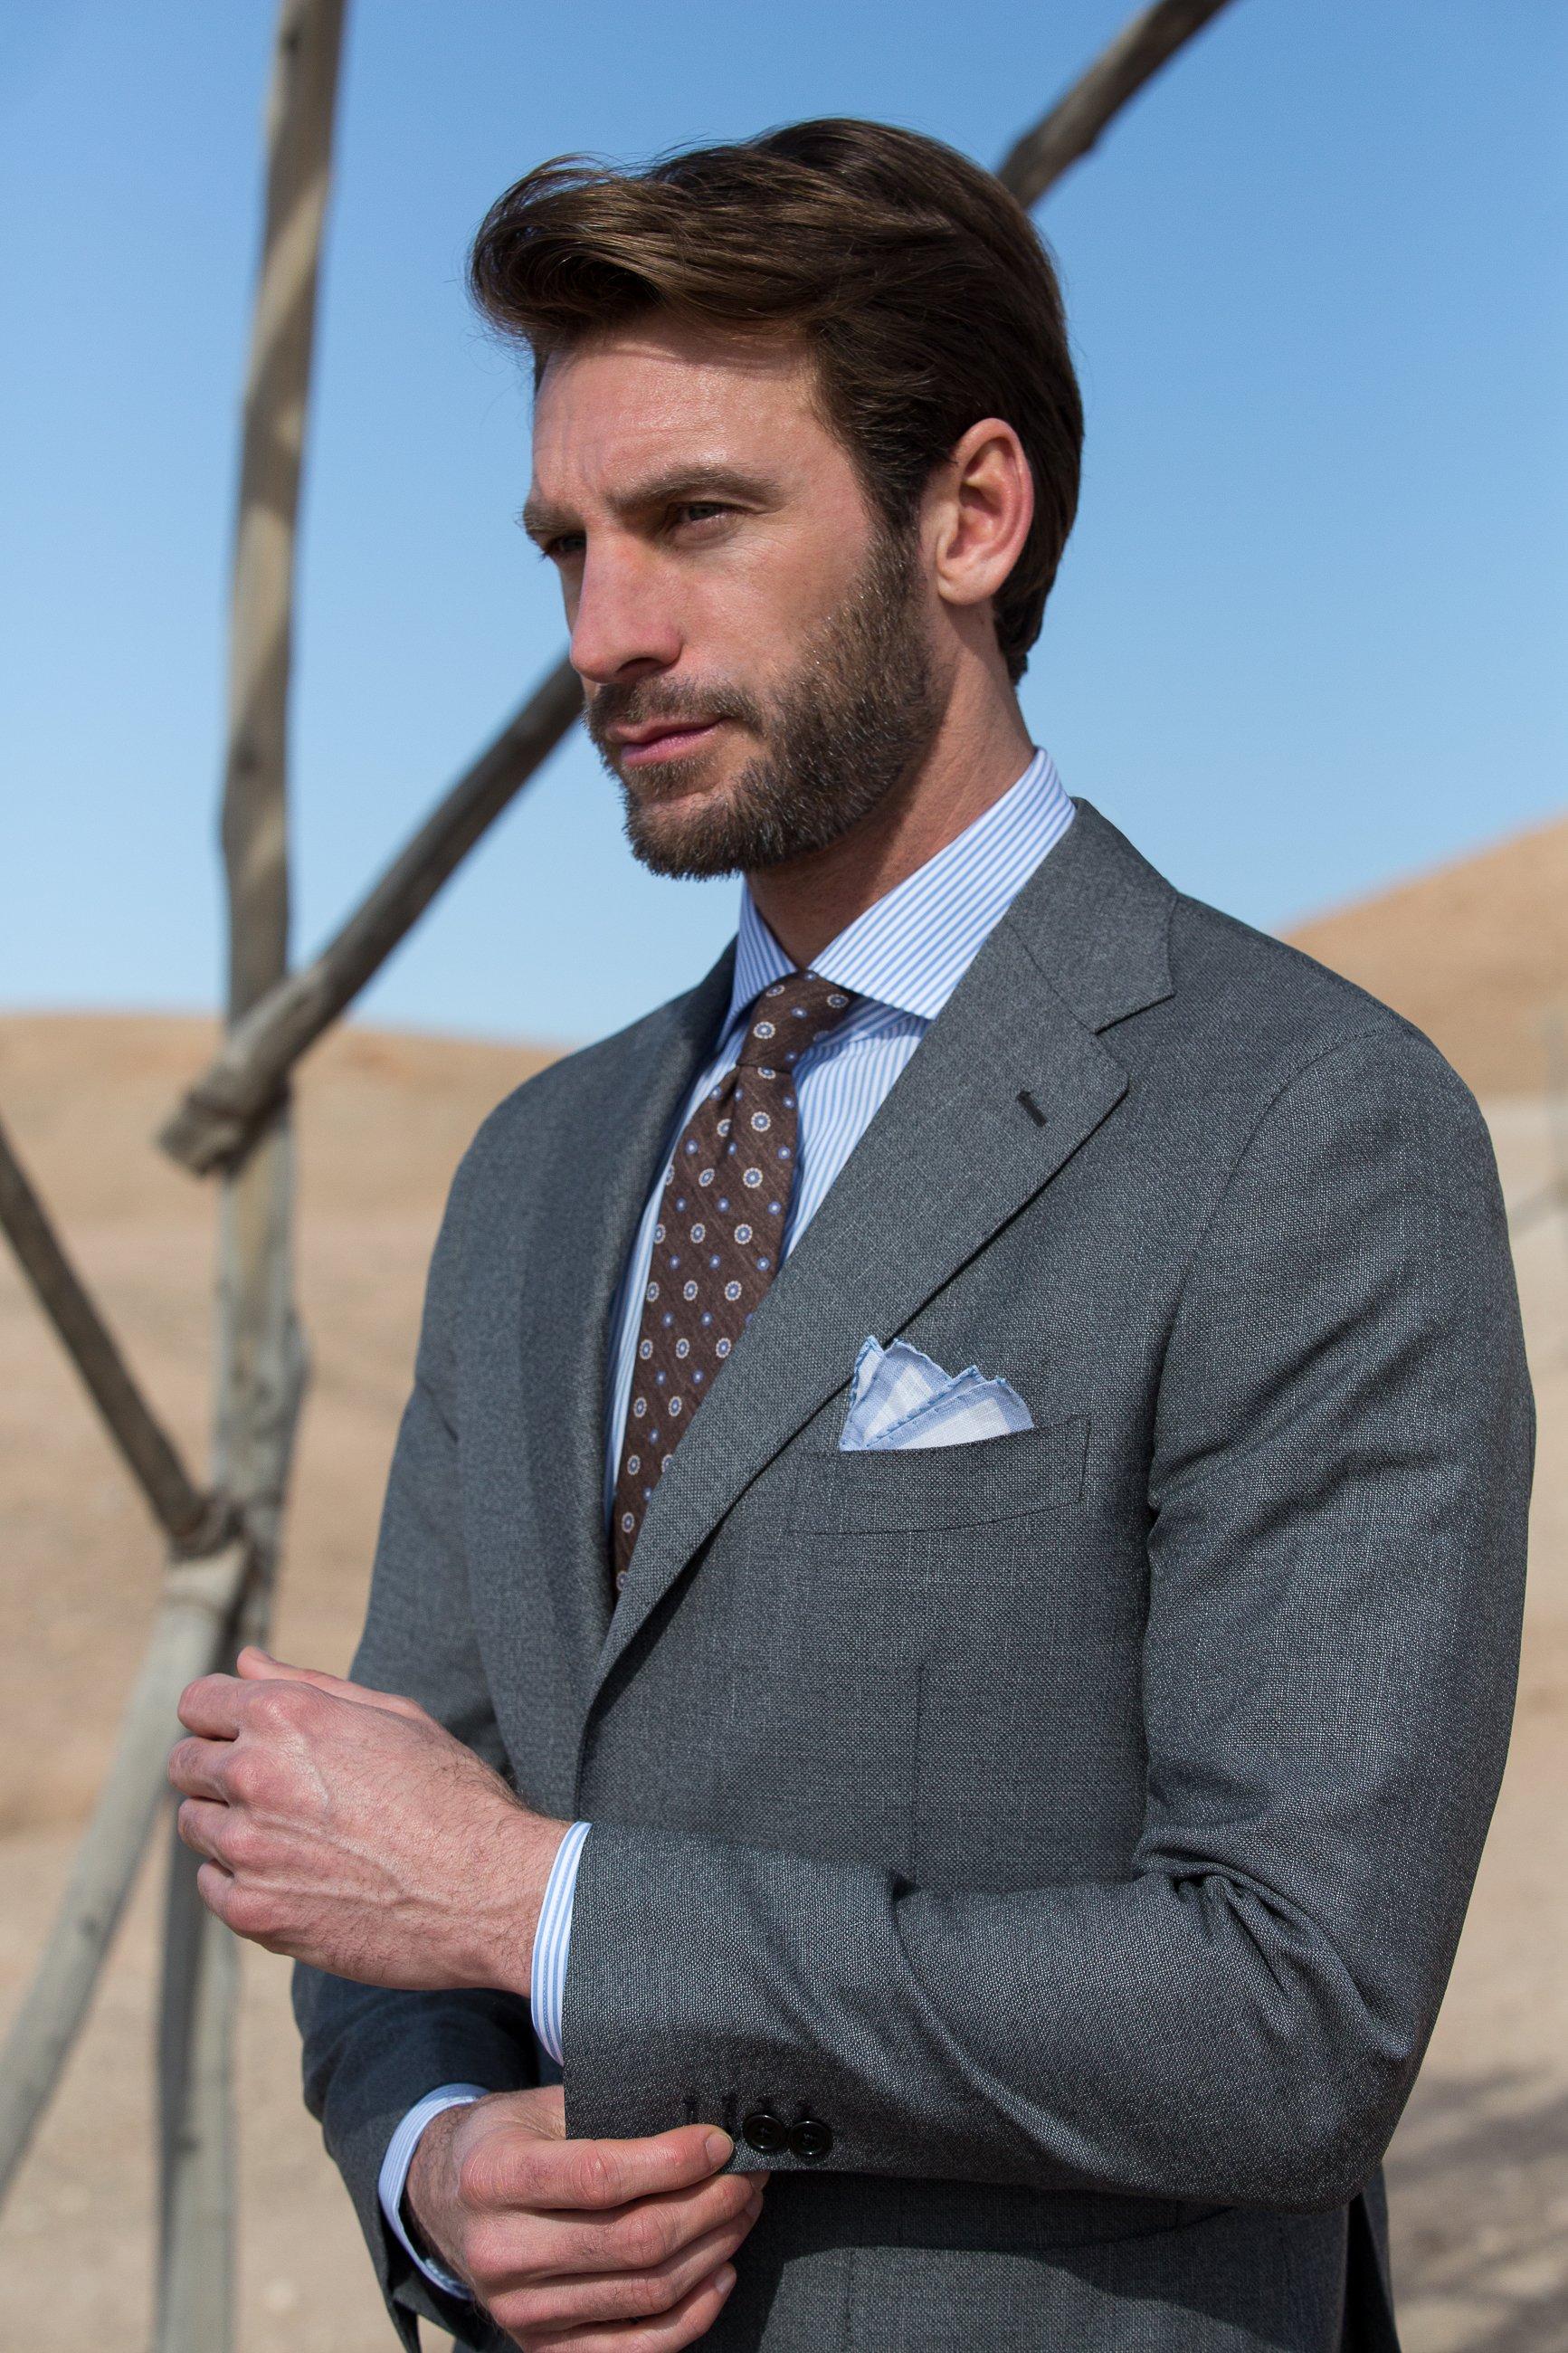 grey_suit_4_2000x.jpg